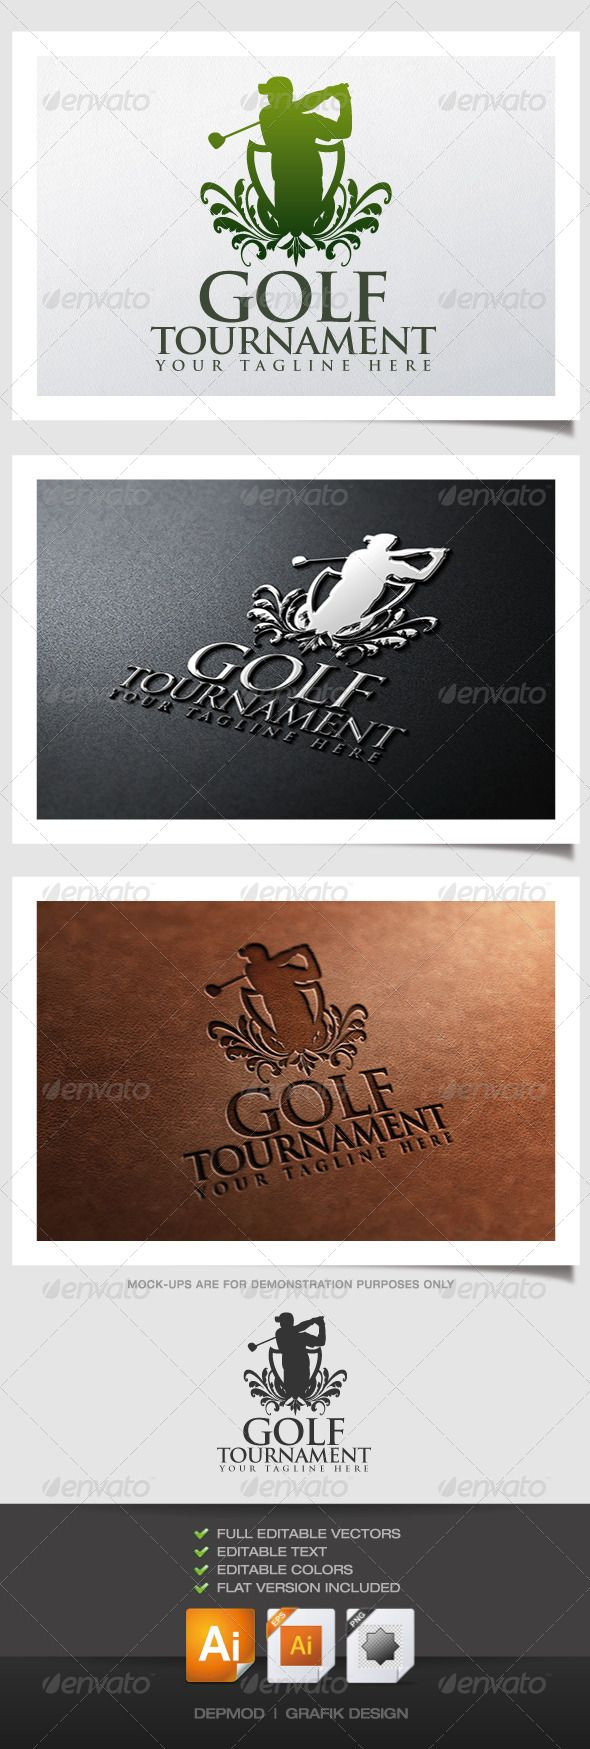 Golf Tournament Crest Logo Pet shop logo, Shop logo